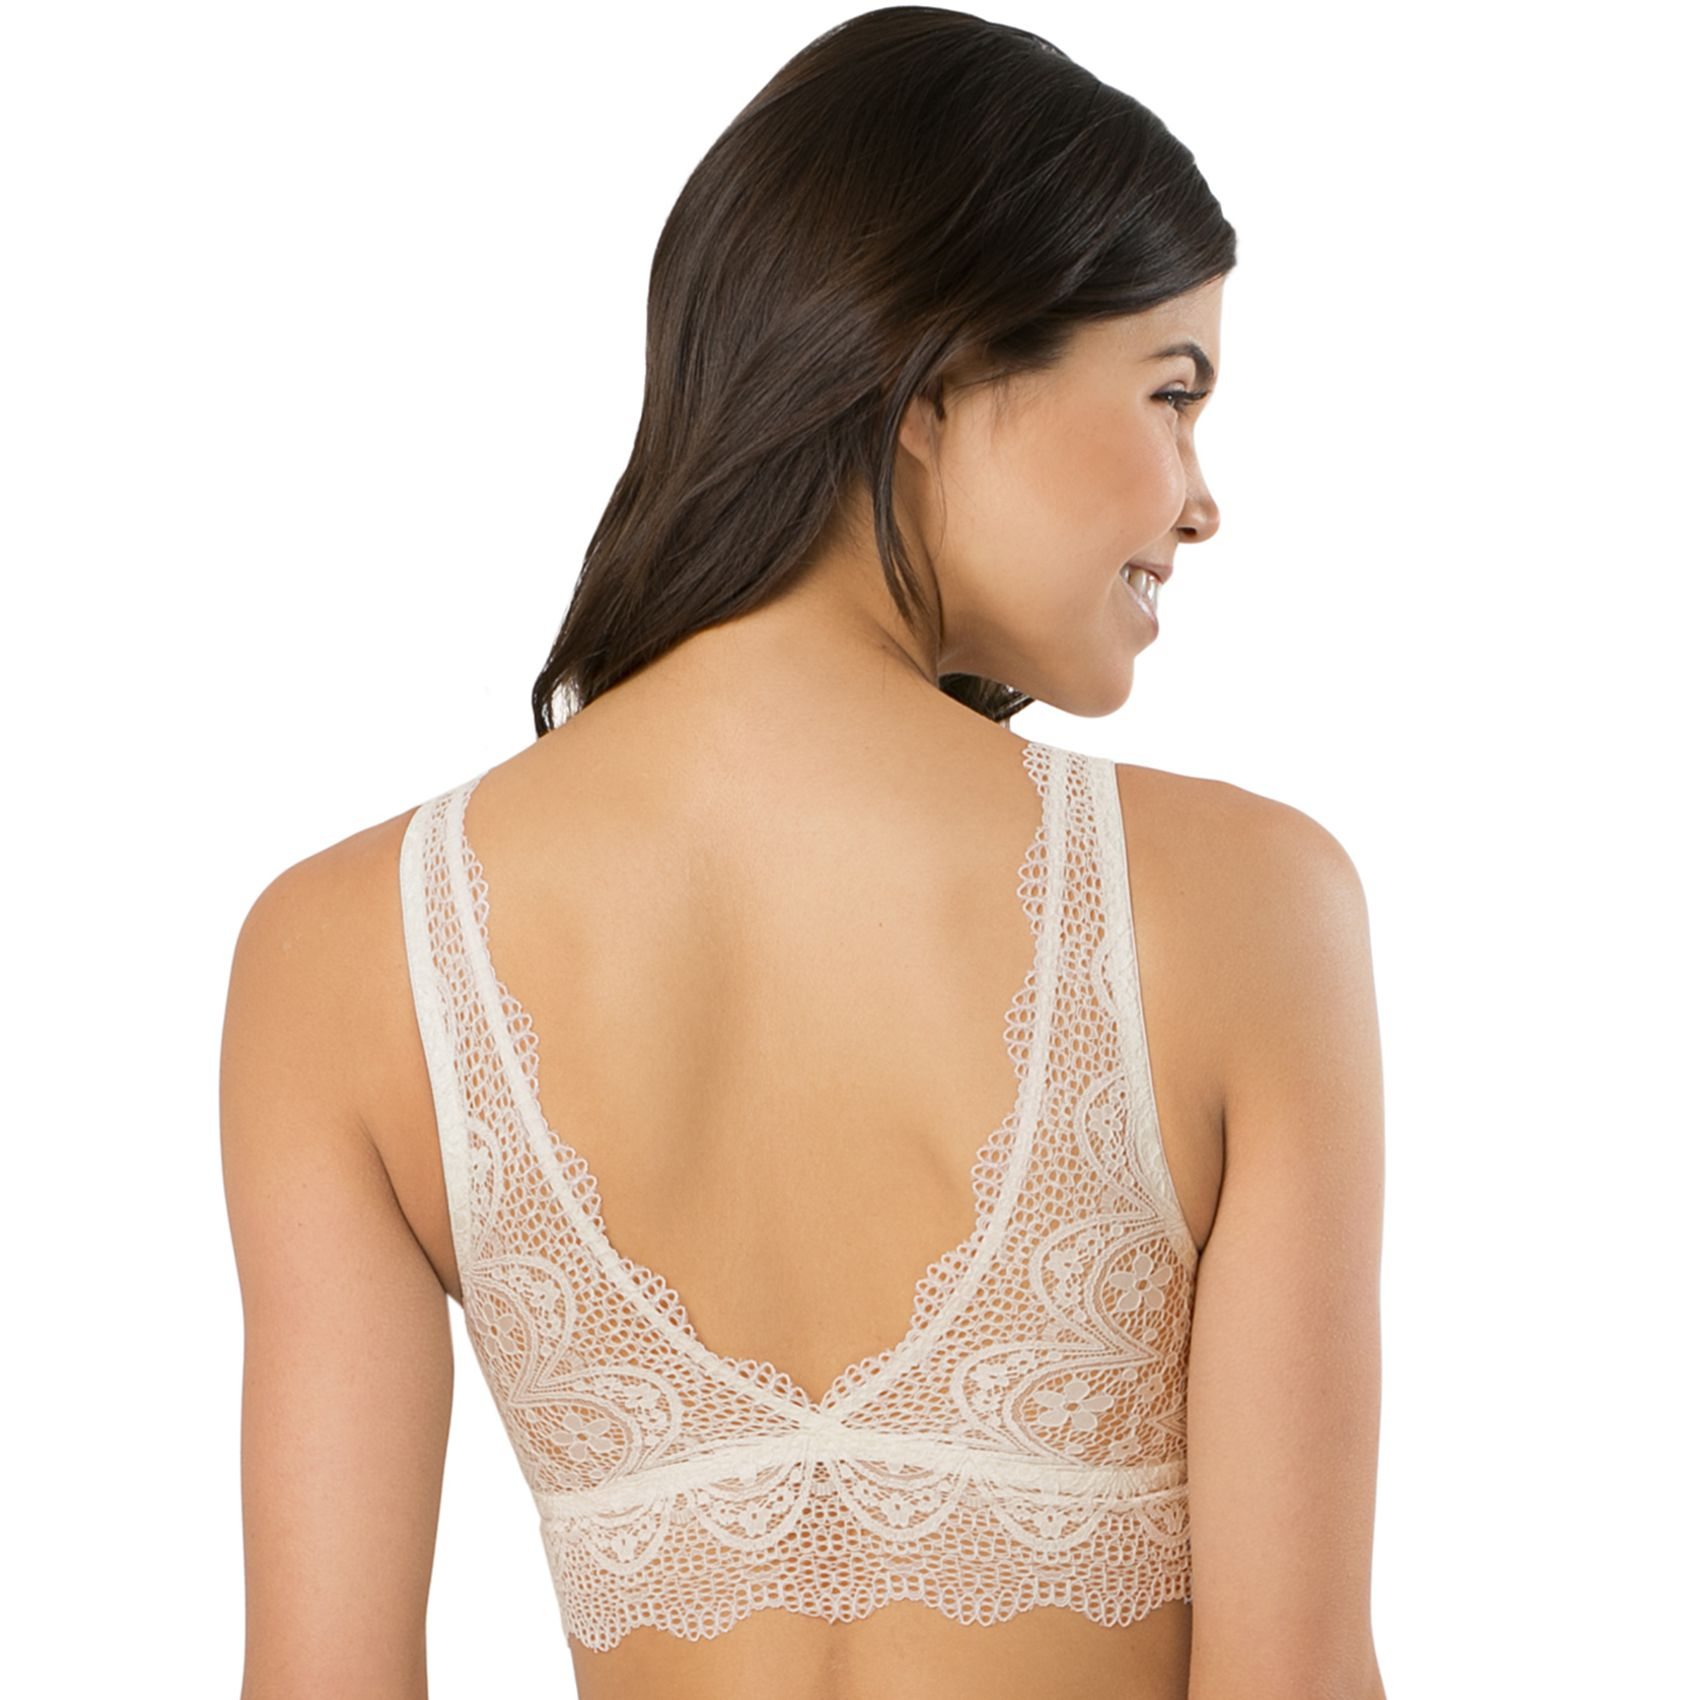 6e0636b71a SO Bralettes Bras - Underwear